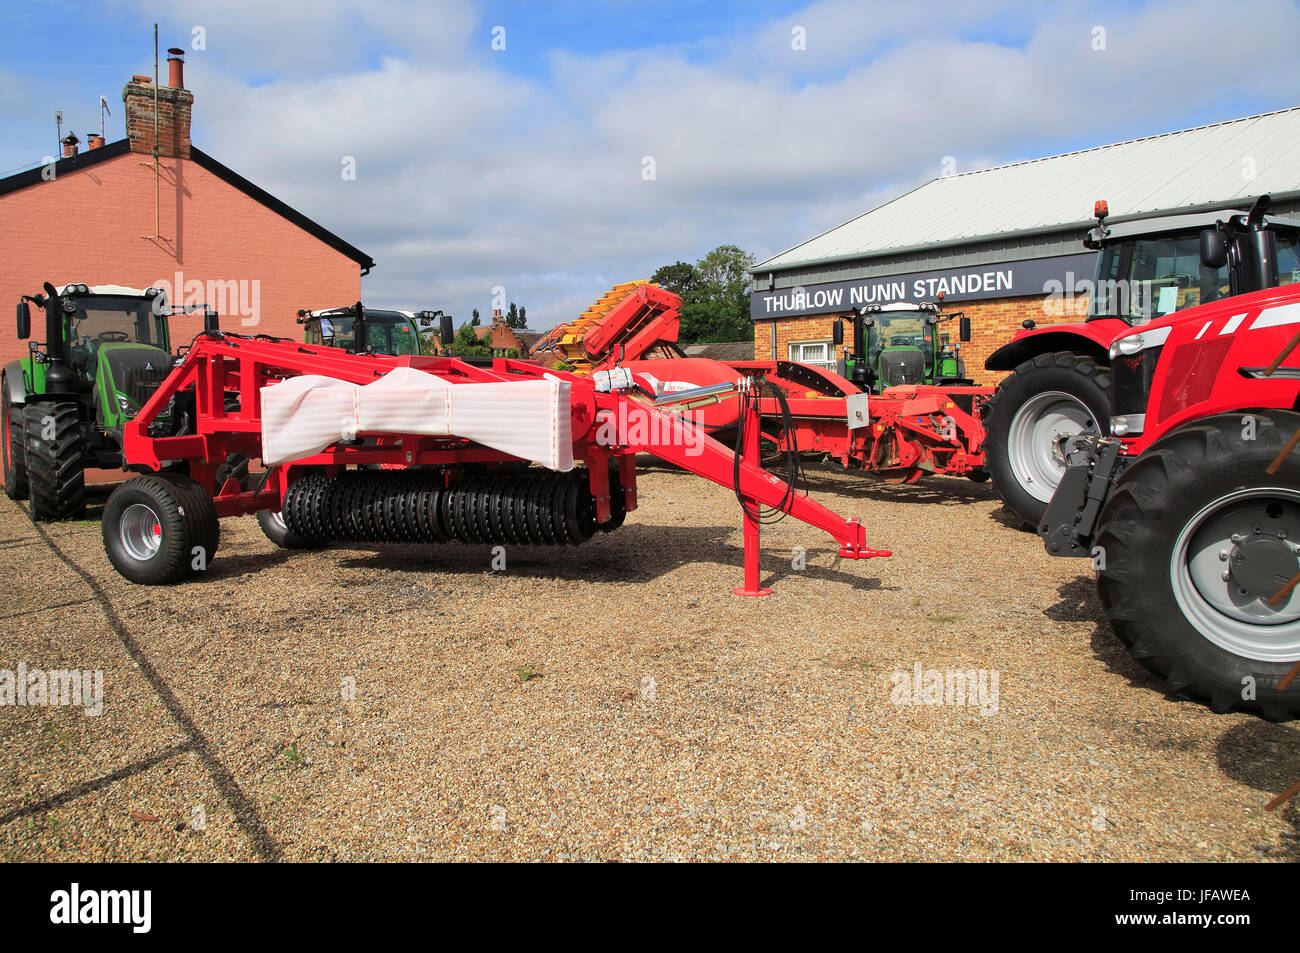 Farm machinery vehicles on sale Thurlow Nunn Standen sales ...